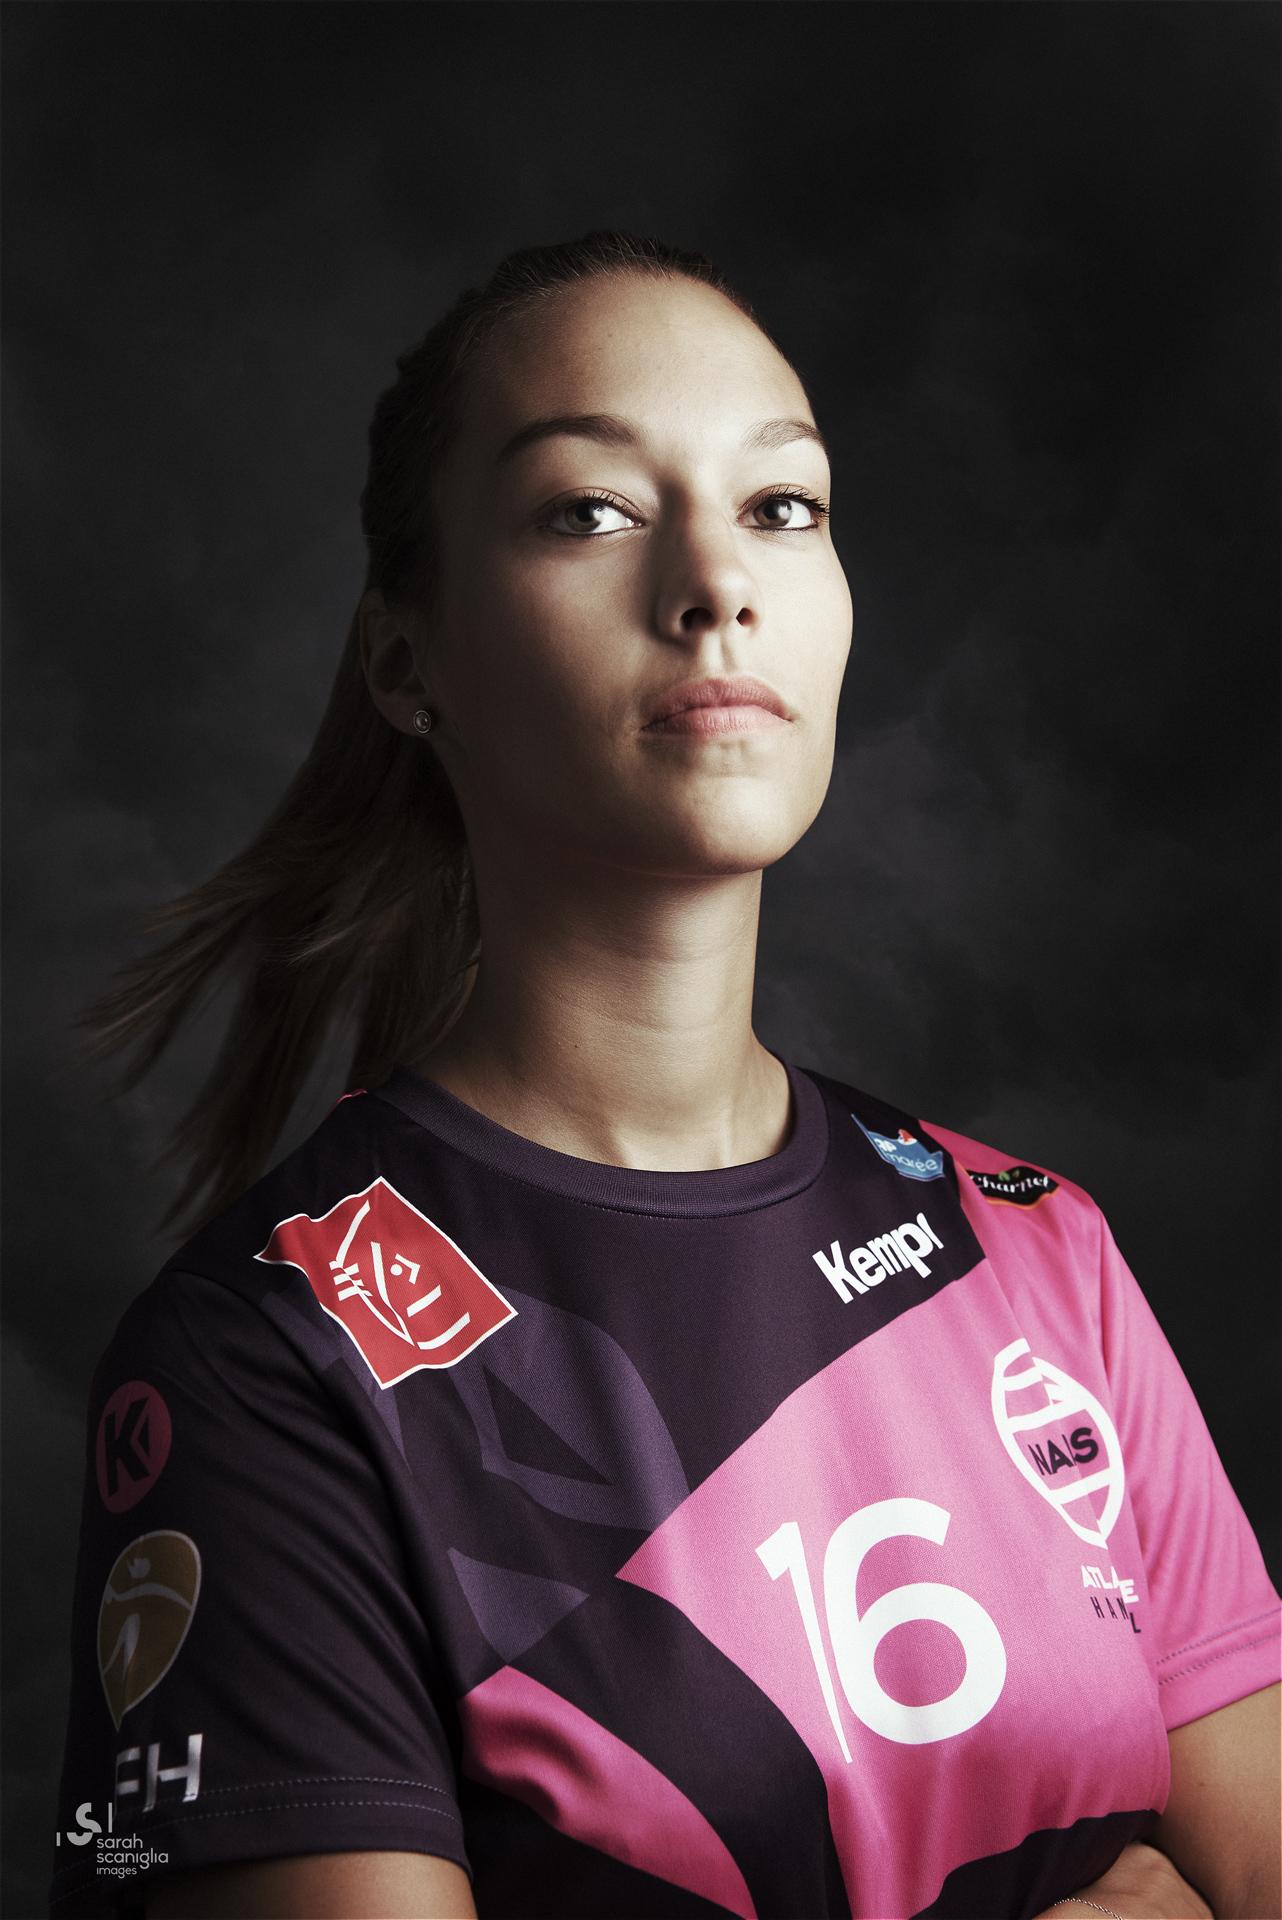 Laurine Chesneau - handball ©sarah scaniglia photographe Nantes